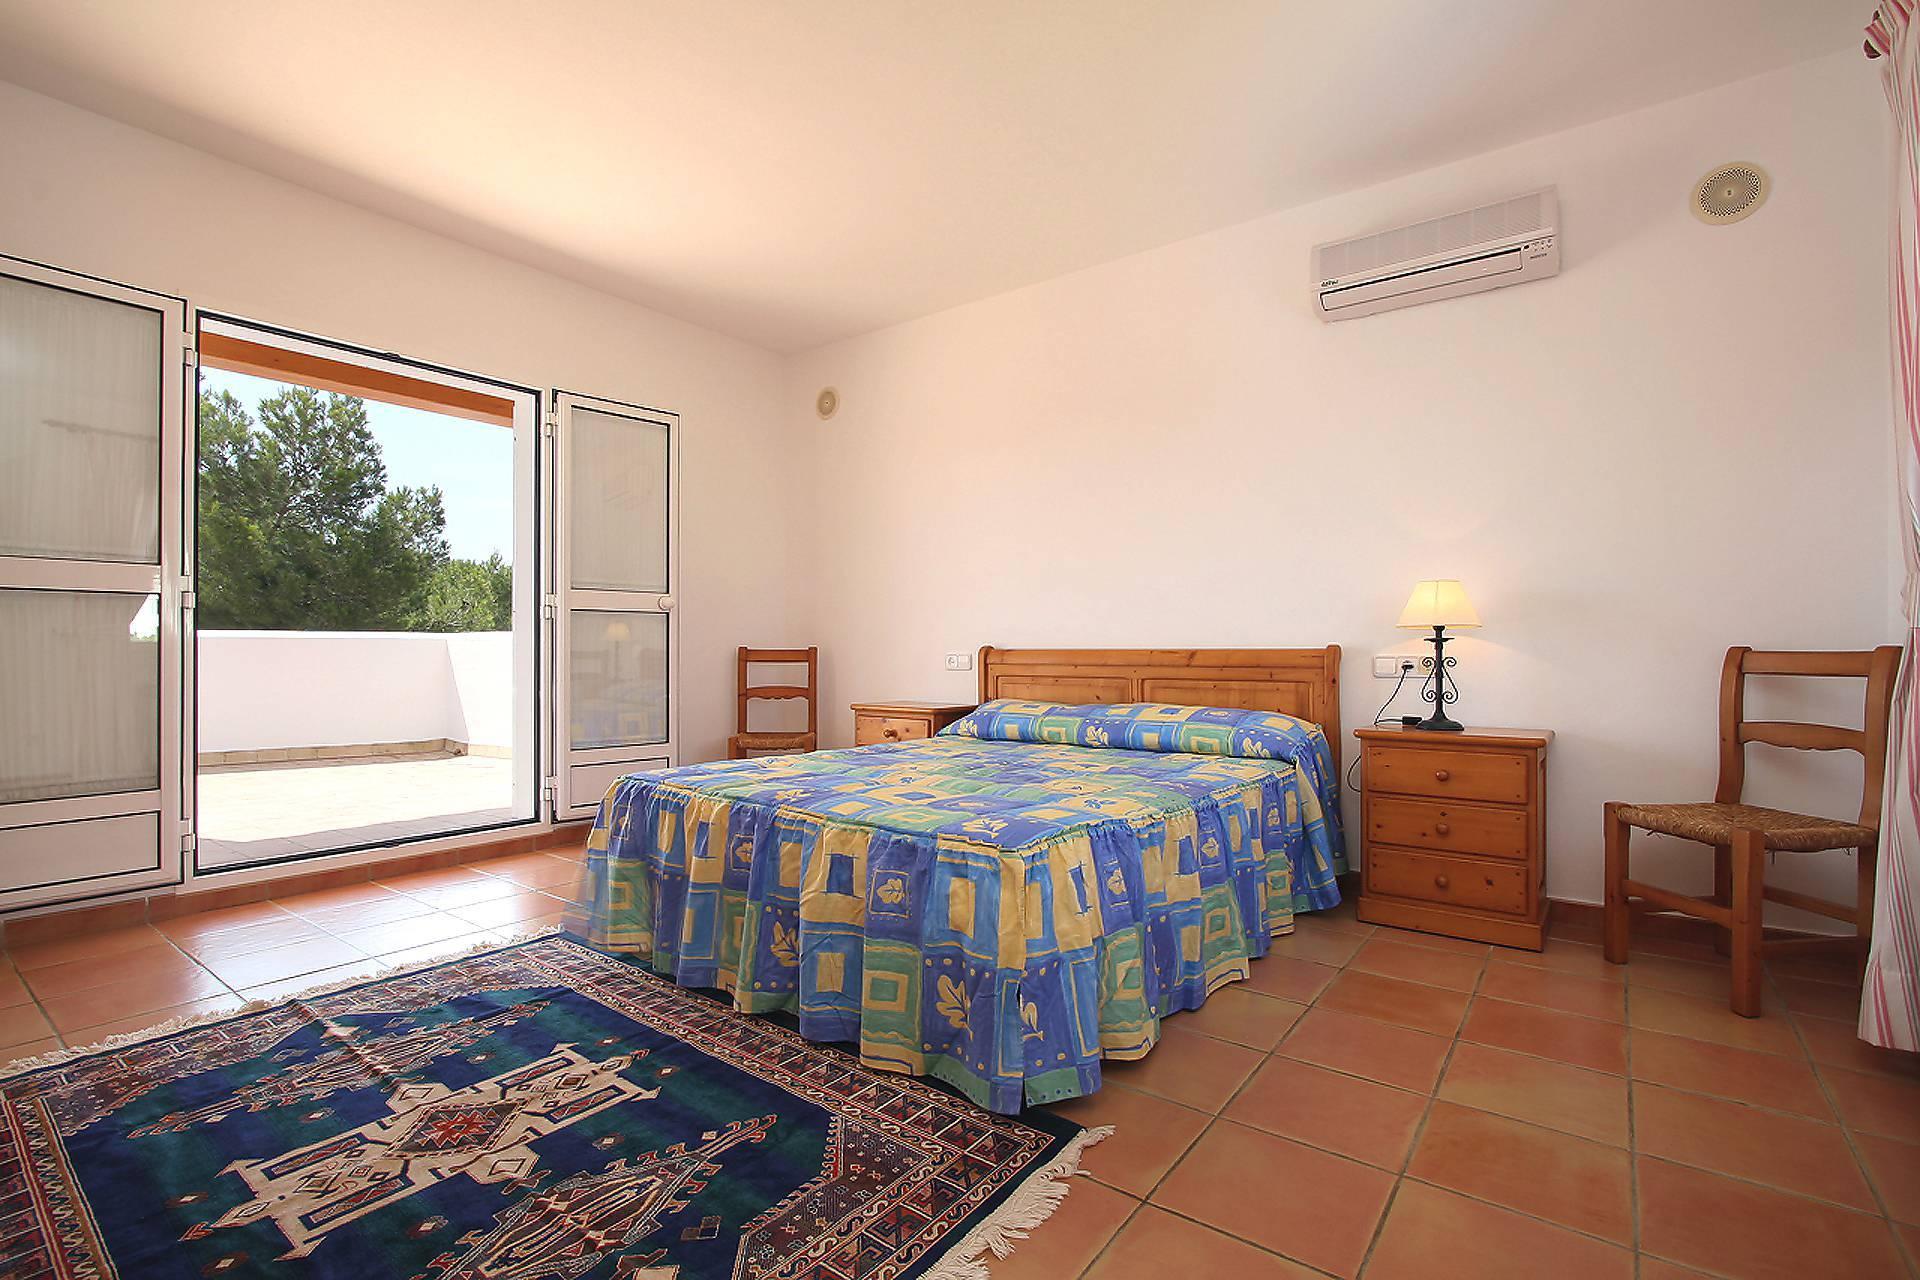 01-128 Rustic holiday home Majorca East Bild 15